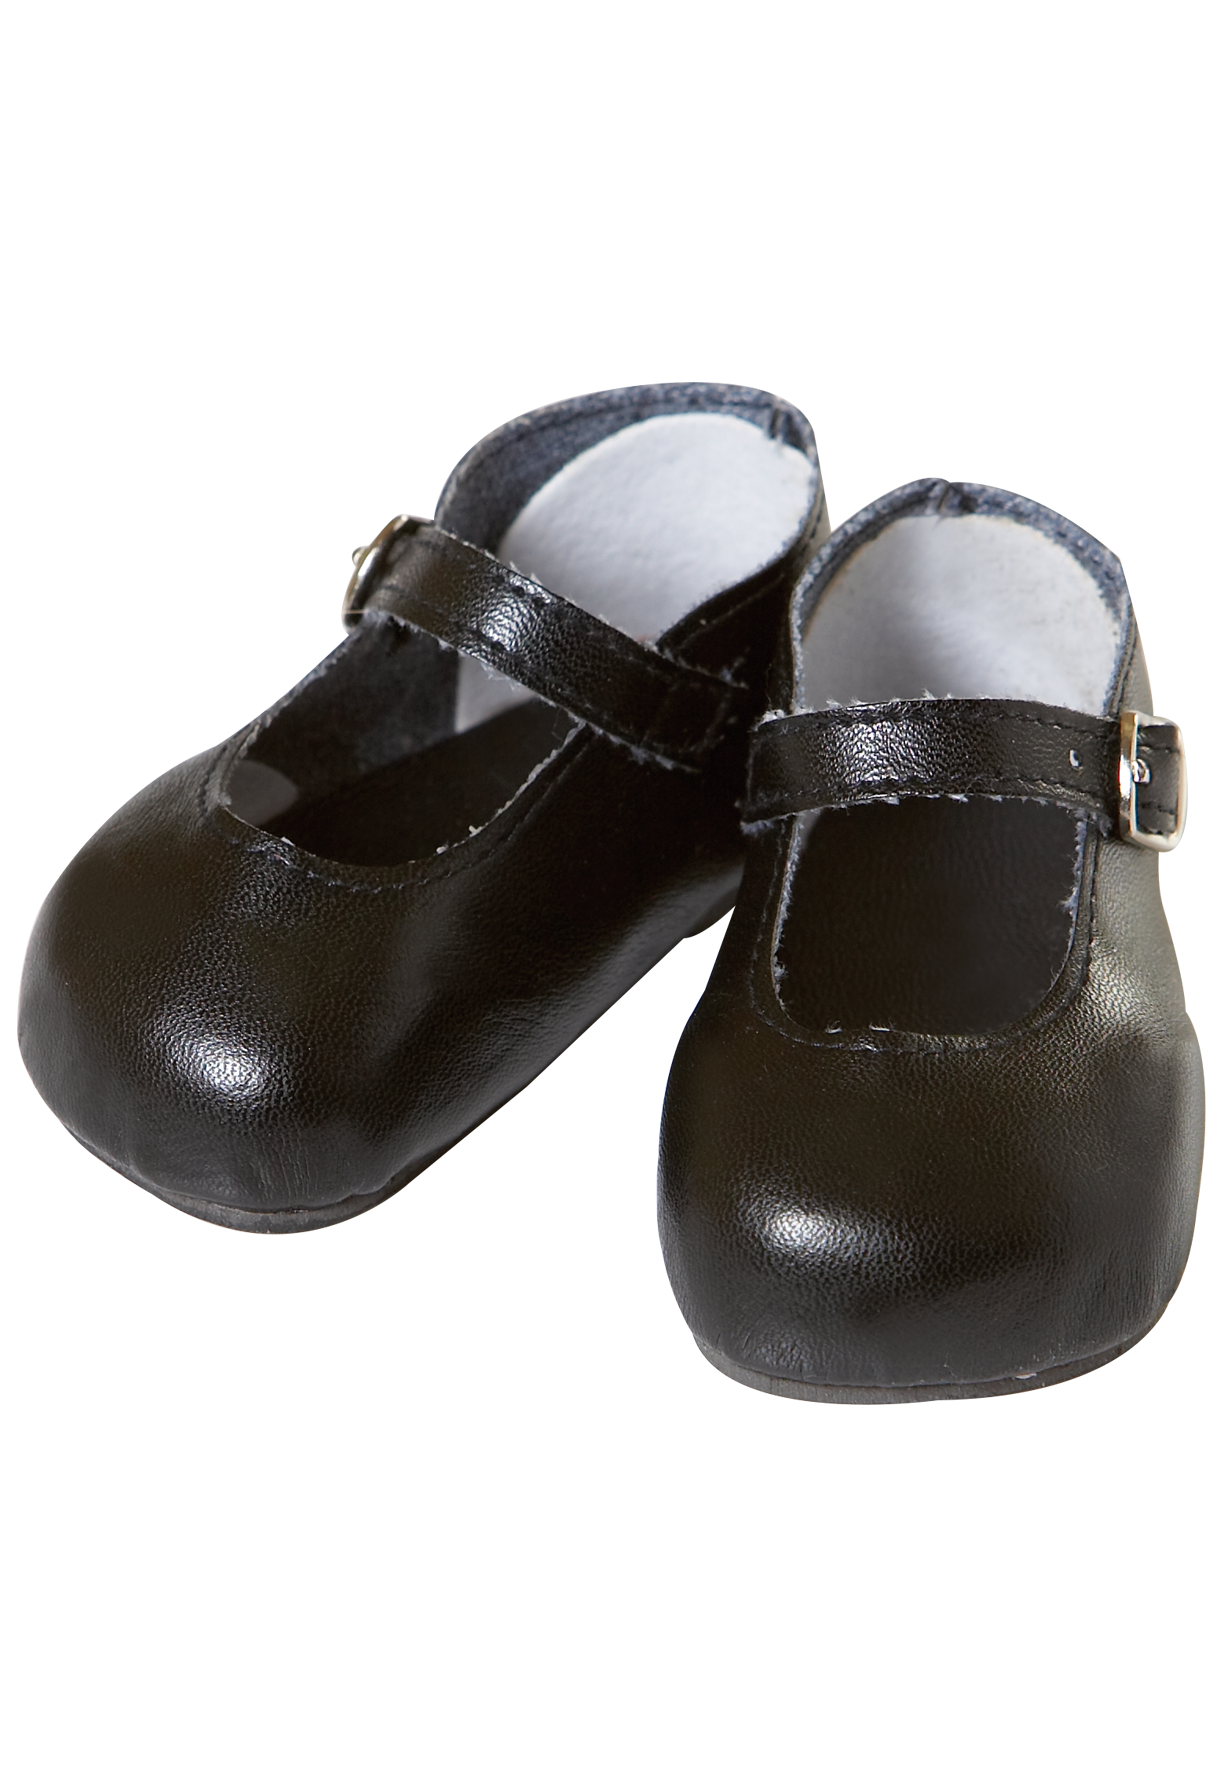 13891afa2c4ef Adora Baby Doll Shoes - Mary Jane - Black | Dolls NOT AG | Baby doll ...